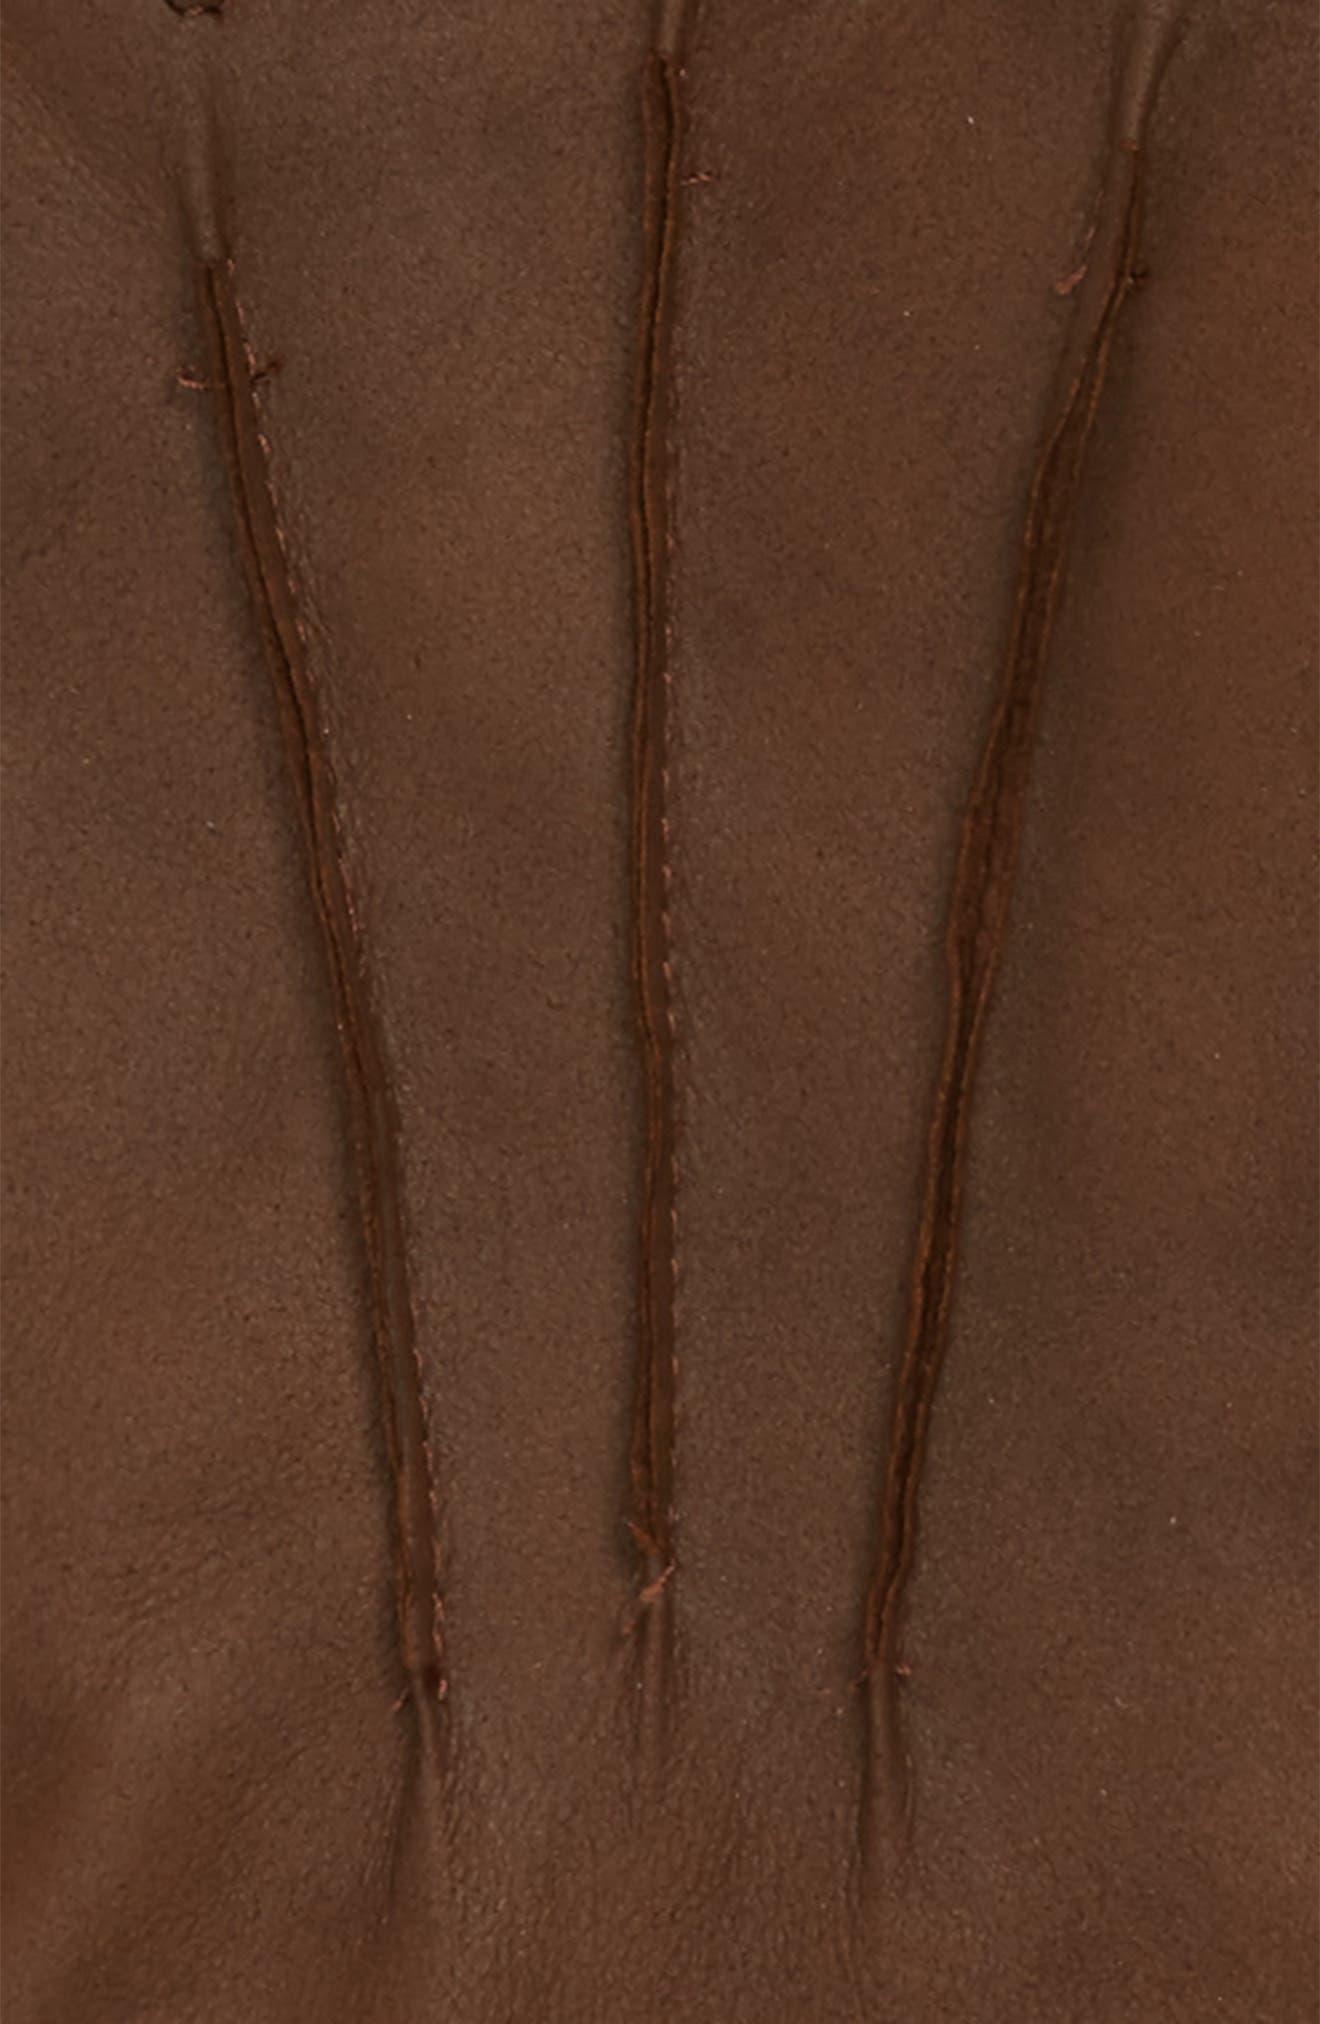 Leather Gloves,                             Alternate thumbnail 2, color,                             Brown Chestnut